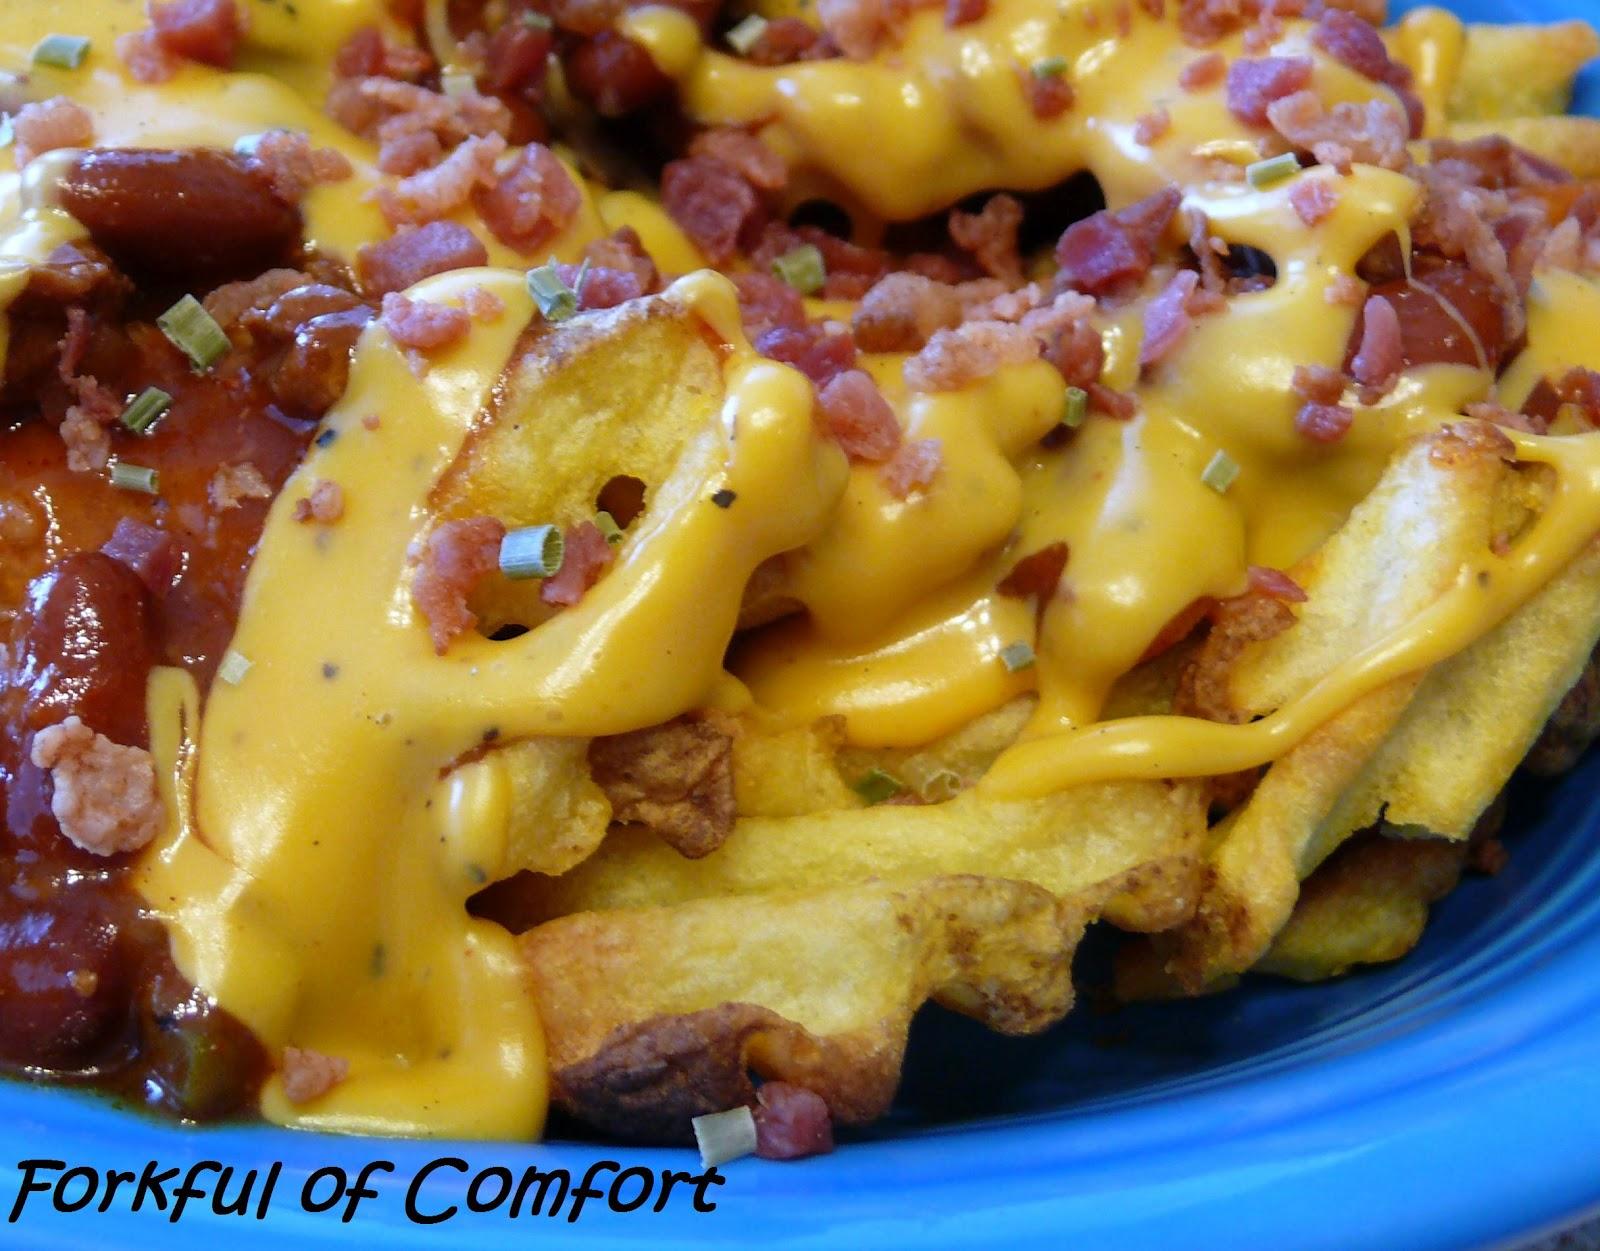 Forkful of Comfort: Beer Cheese Fries